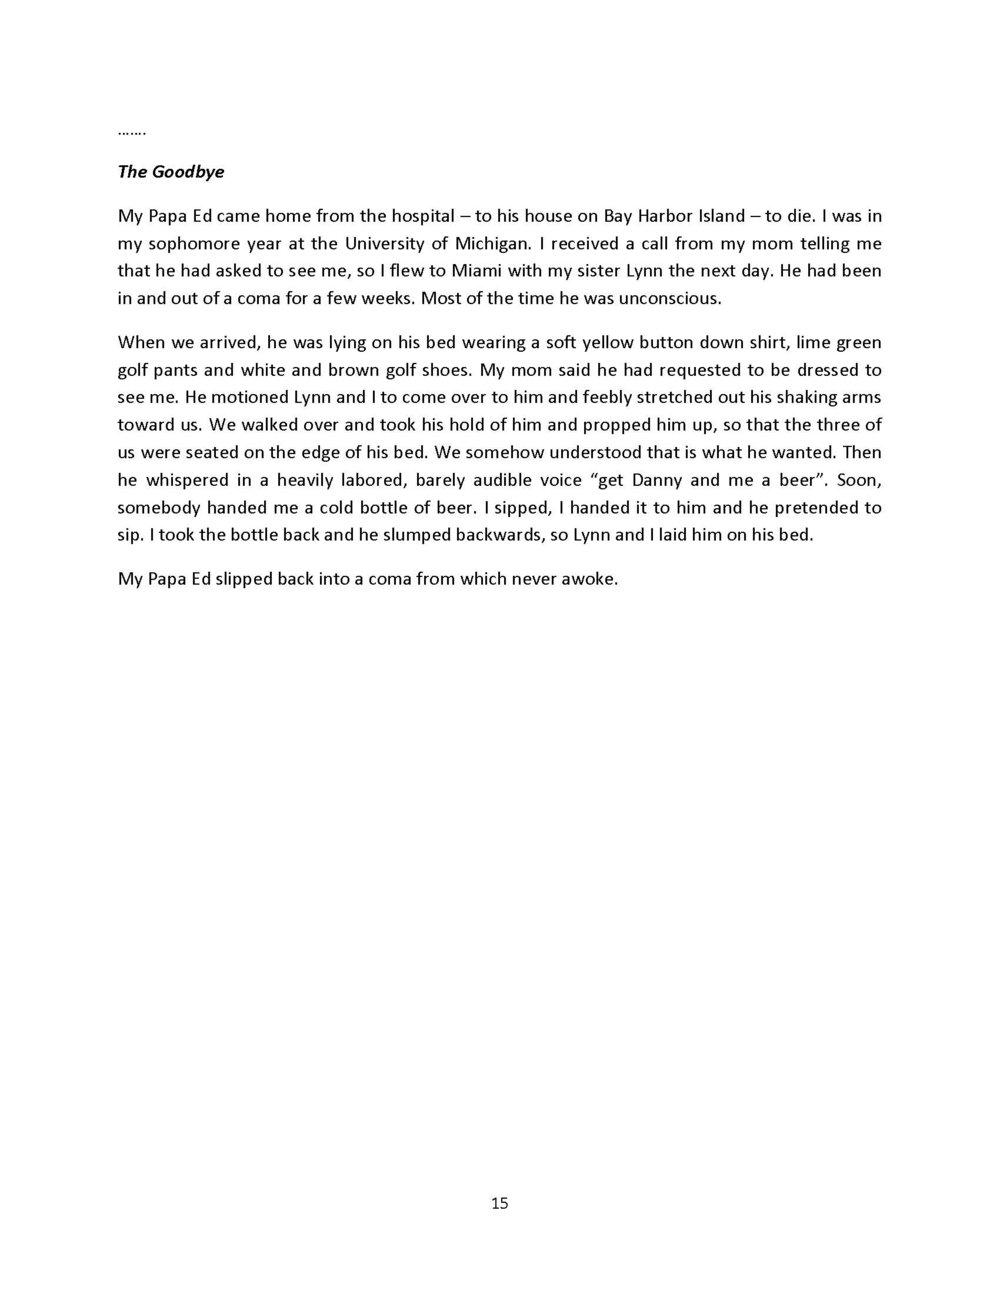 Papa Ed Stories -excerpts_Page_15.jpg